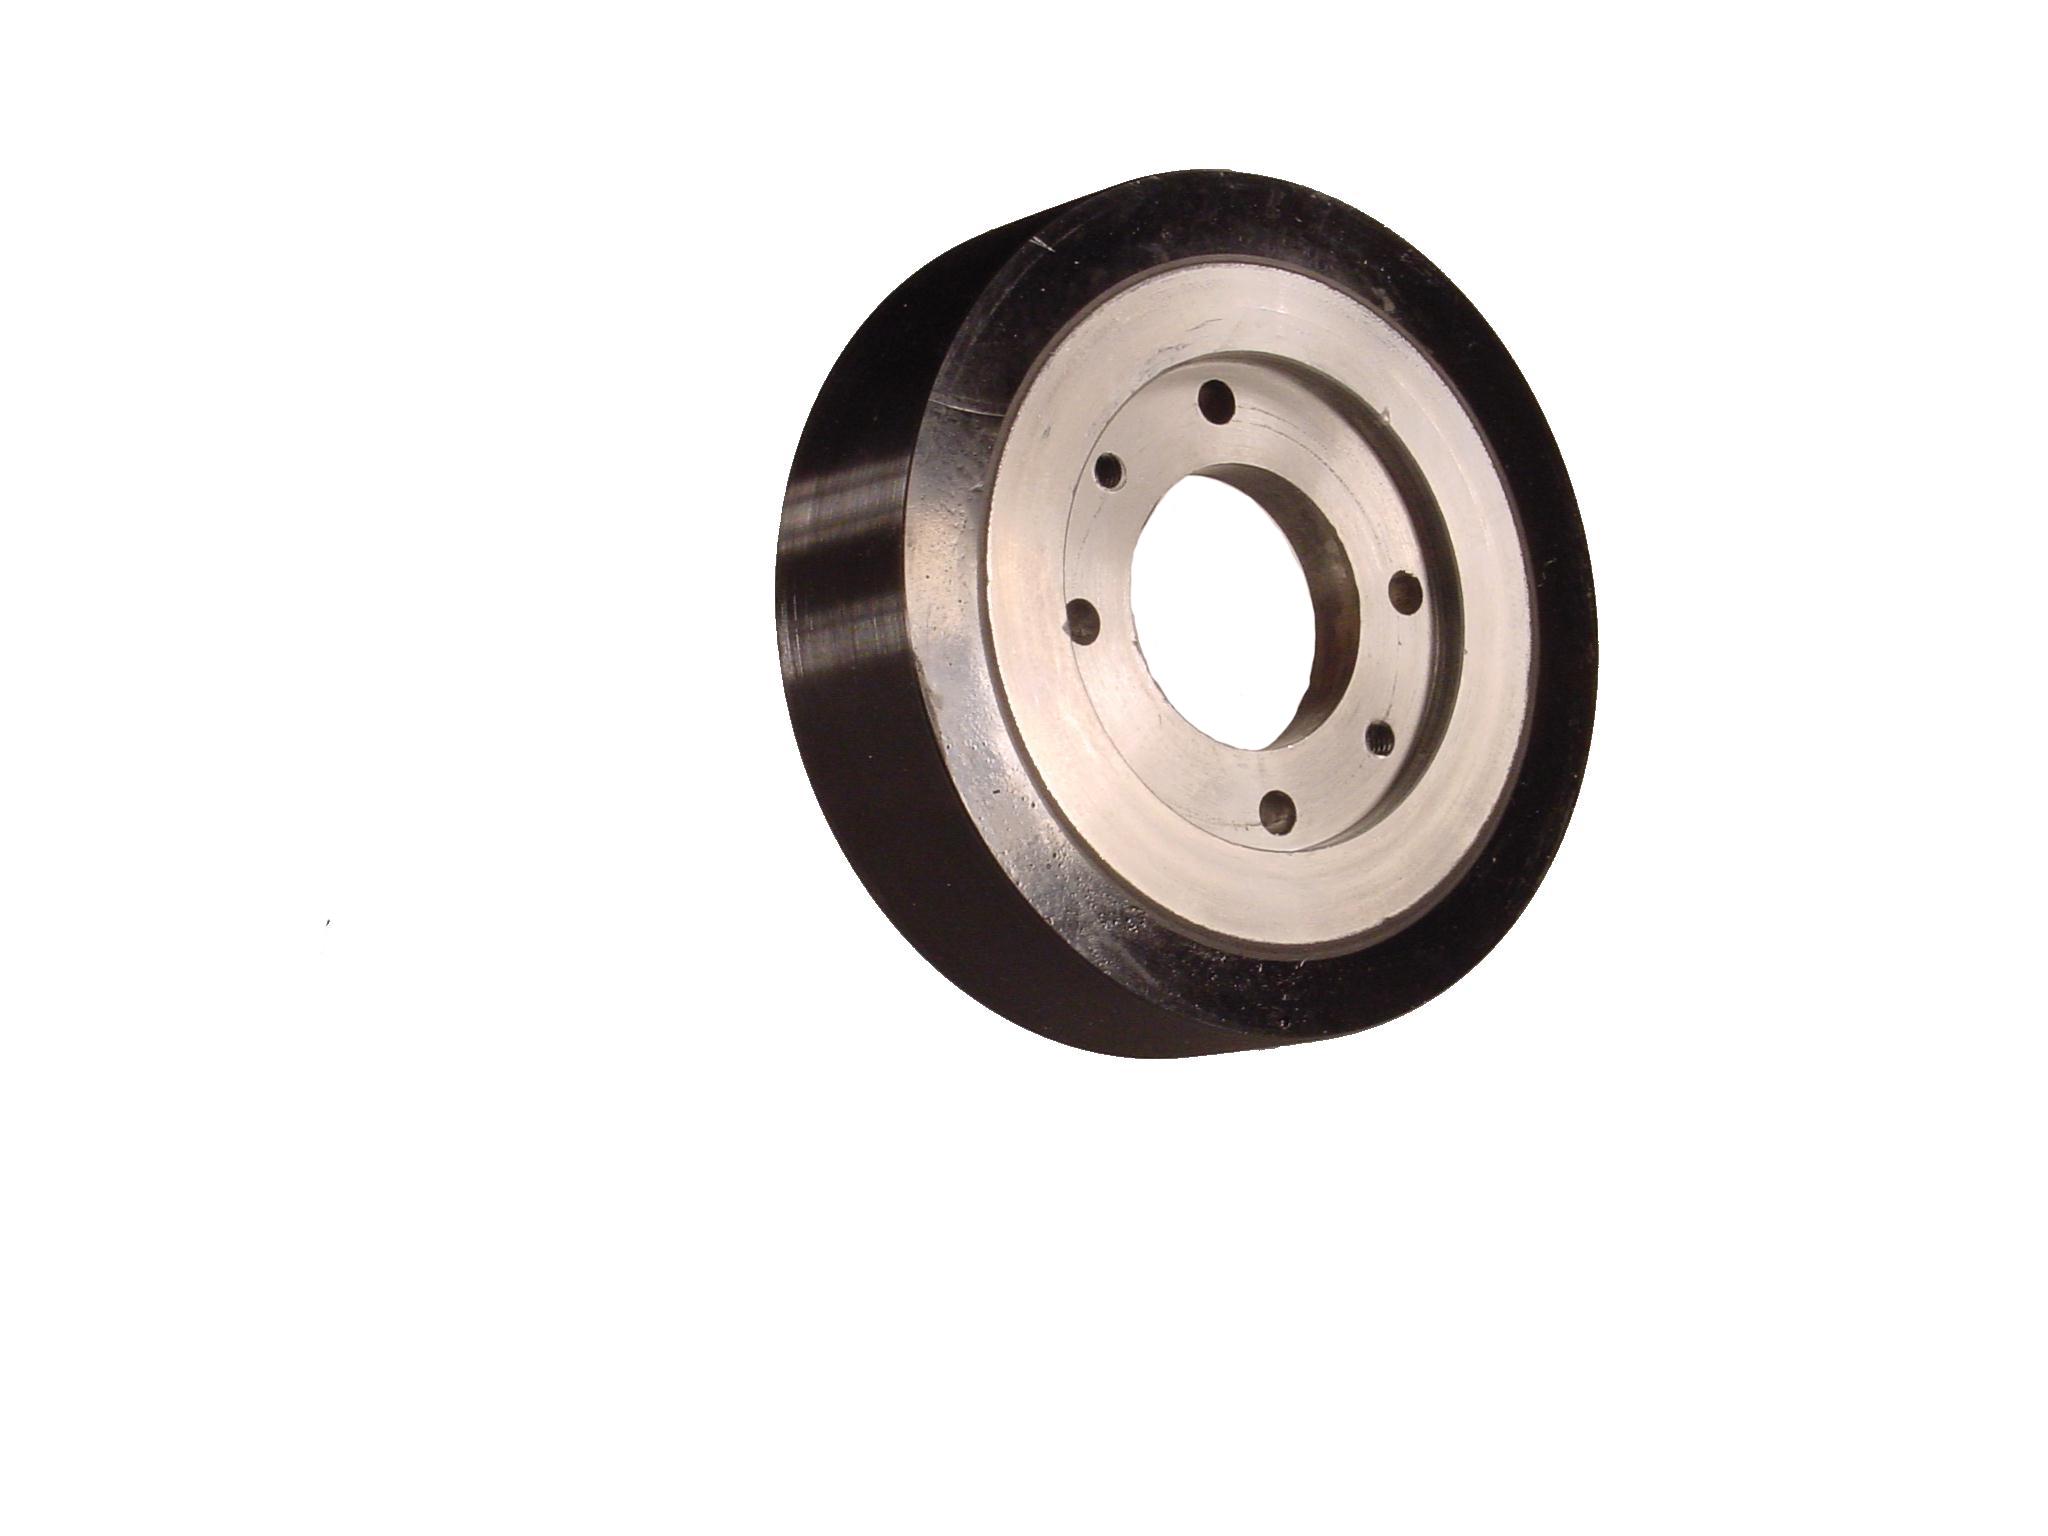 handrail-drive-roller-pw152b238g01